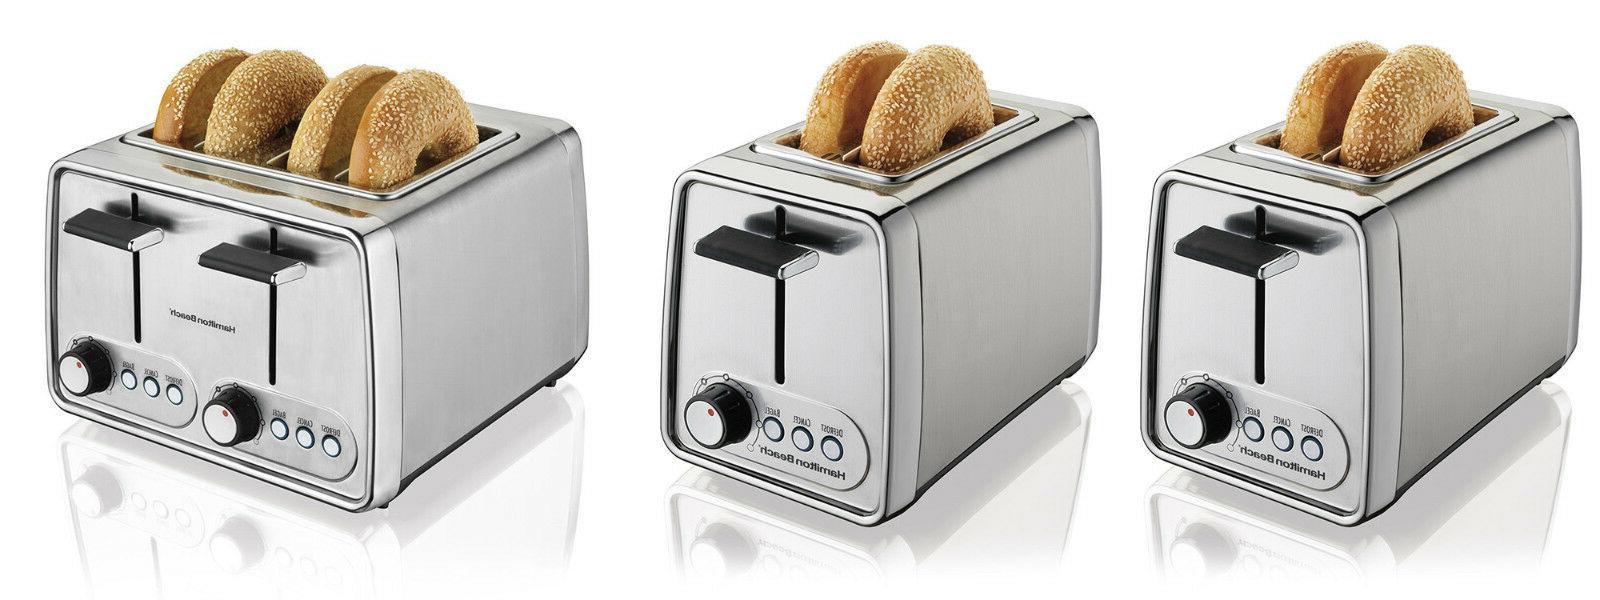 Hamilton Beach Modern Chrome Toaster, 3 Styles